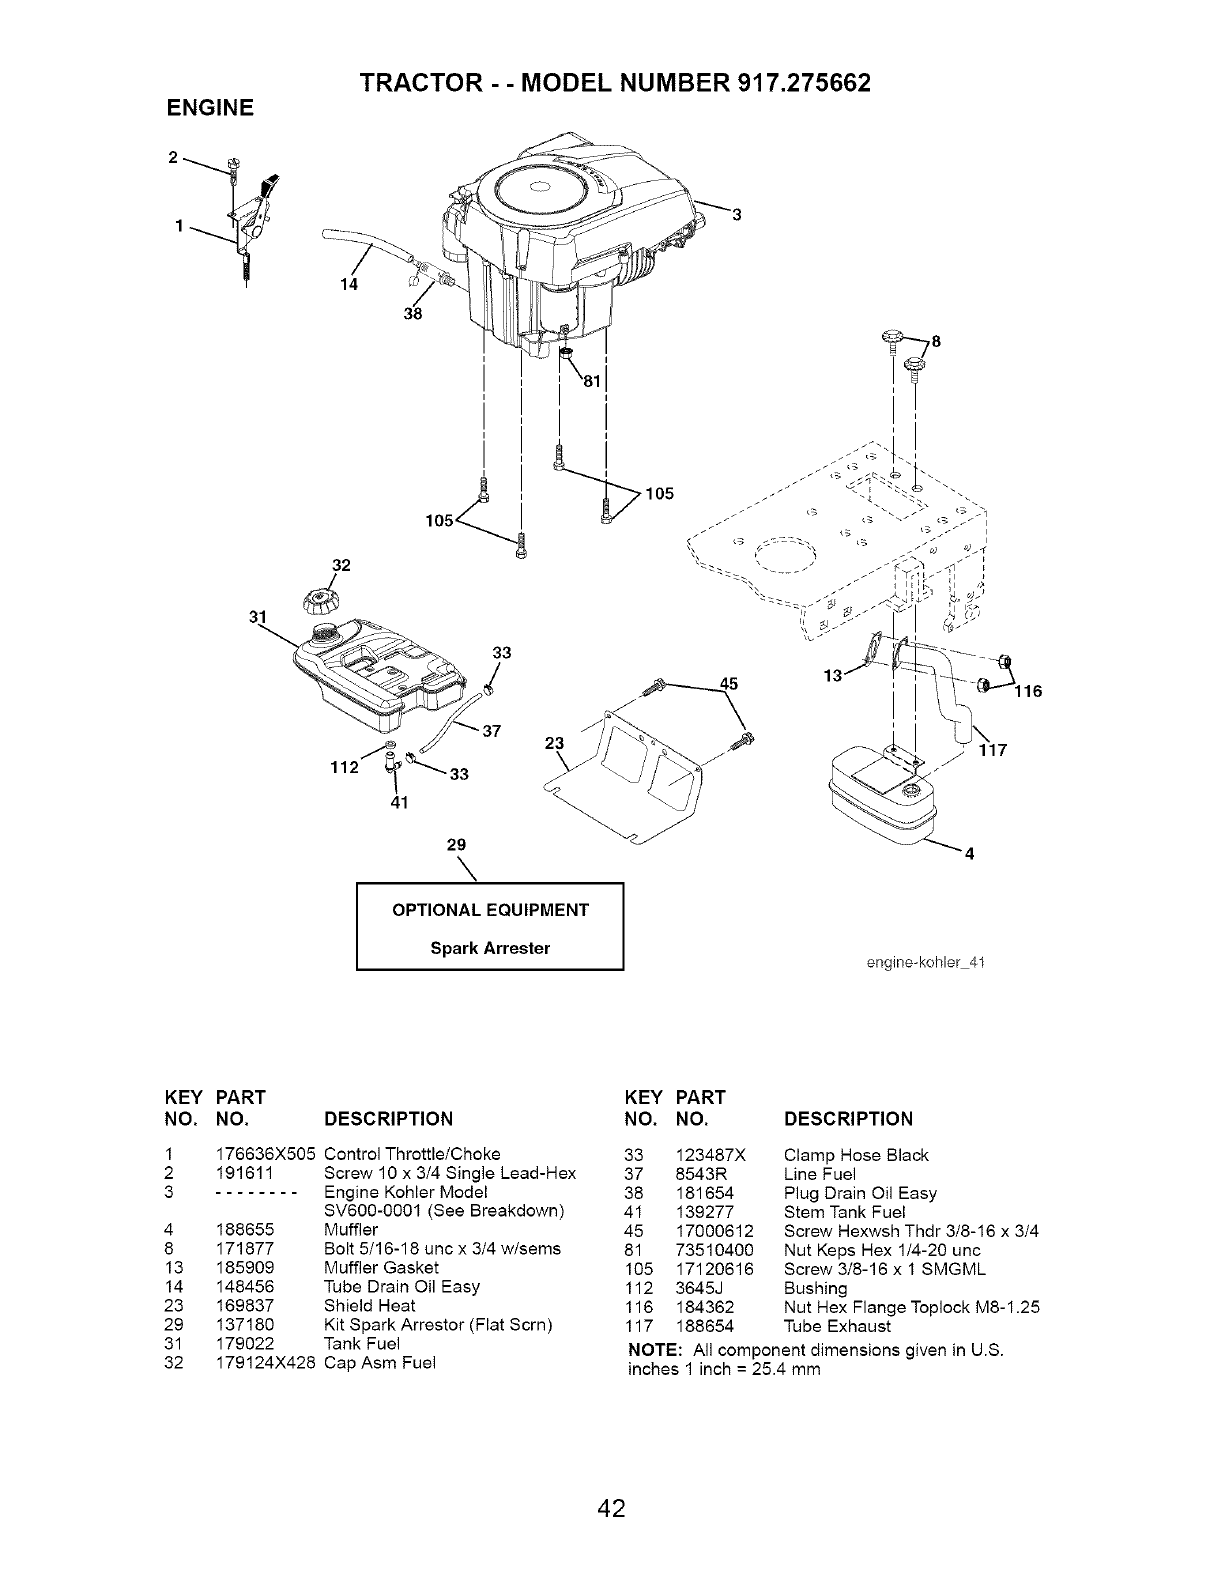 Craftsman 917275662 User Manual Tractor Manuals And Guides L0505017 Kohler 18 Hp 1046 Wiring Diagram Engine Model Number